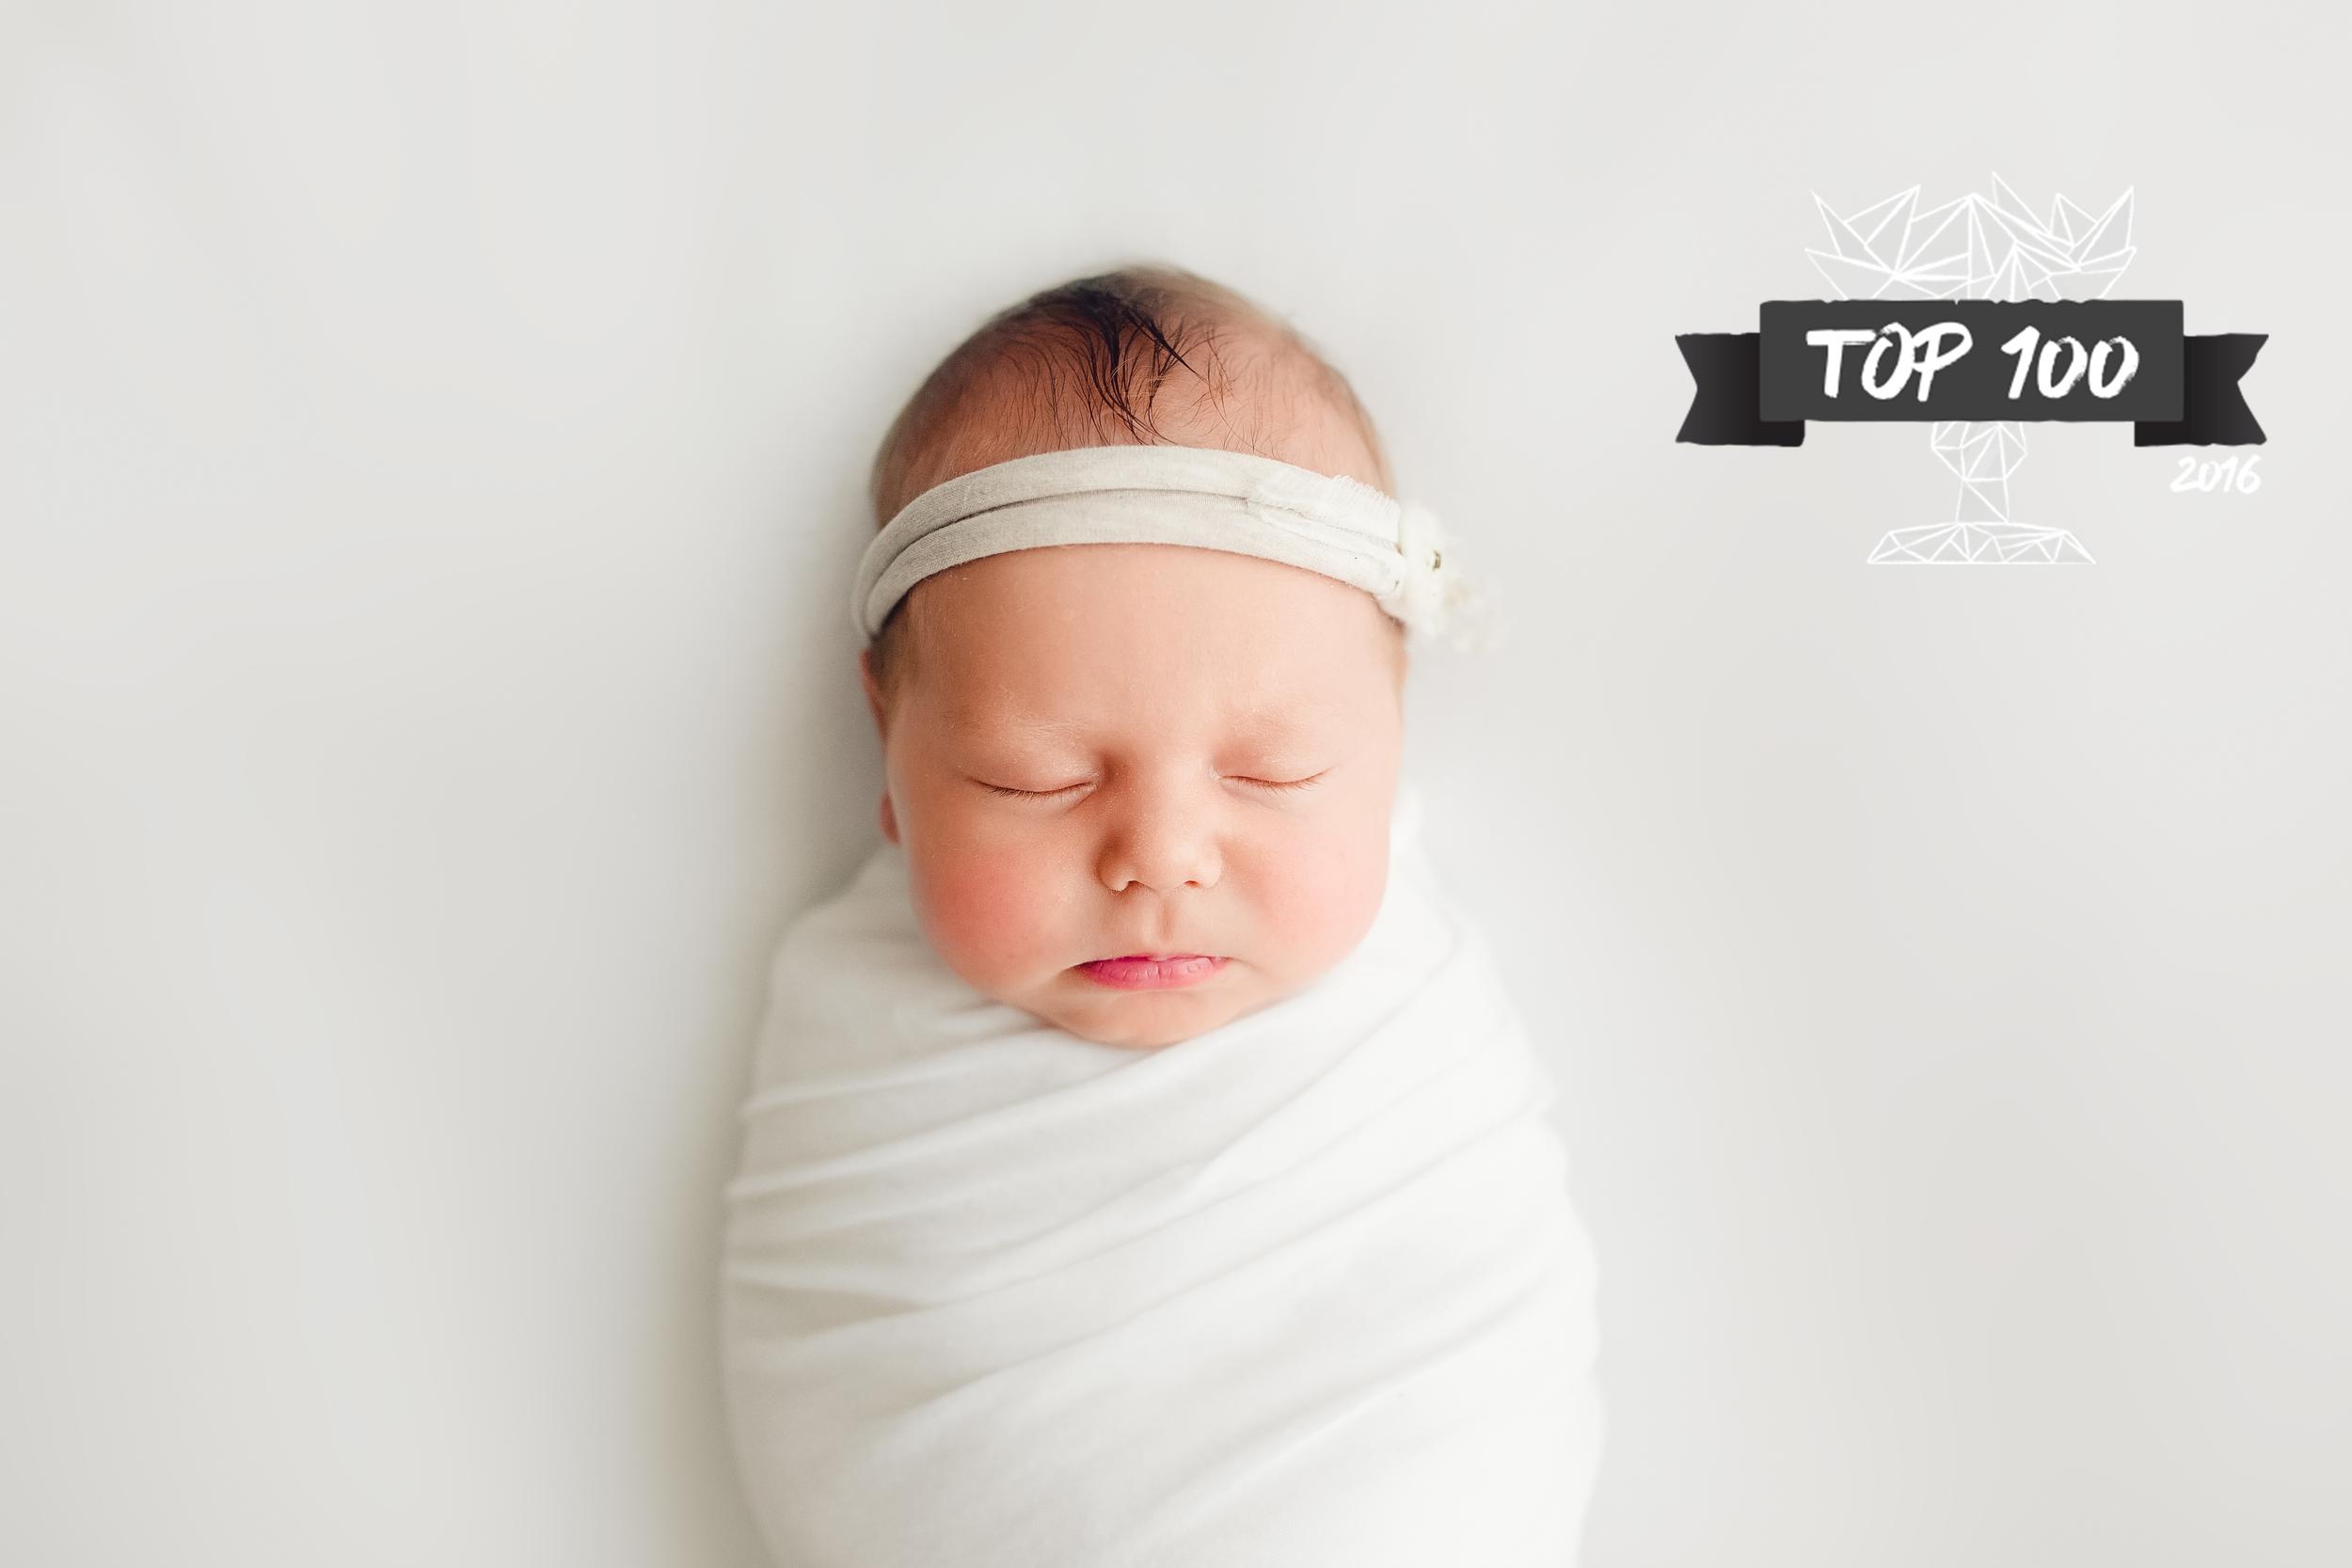 Award Winning Newborn Photographer Diana Moschitz